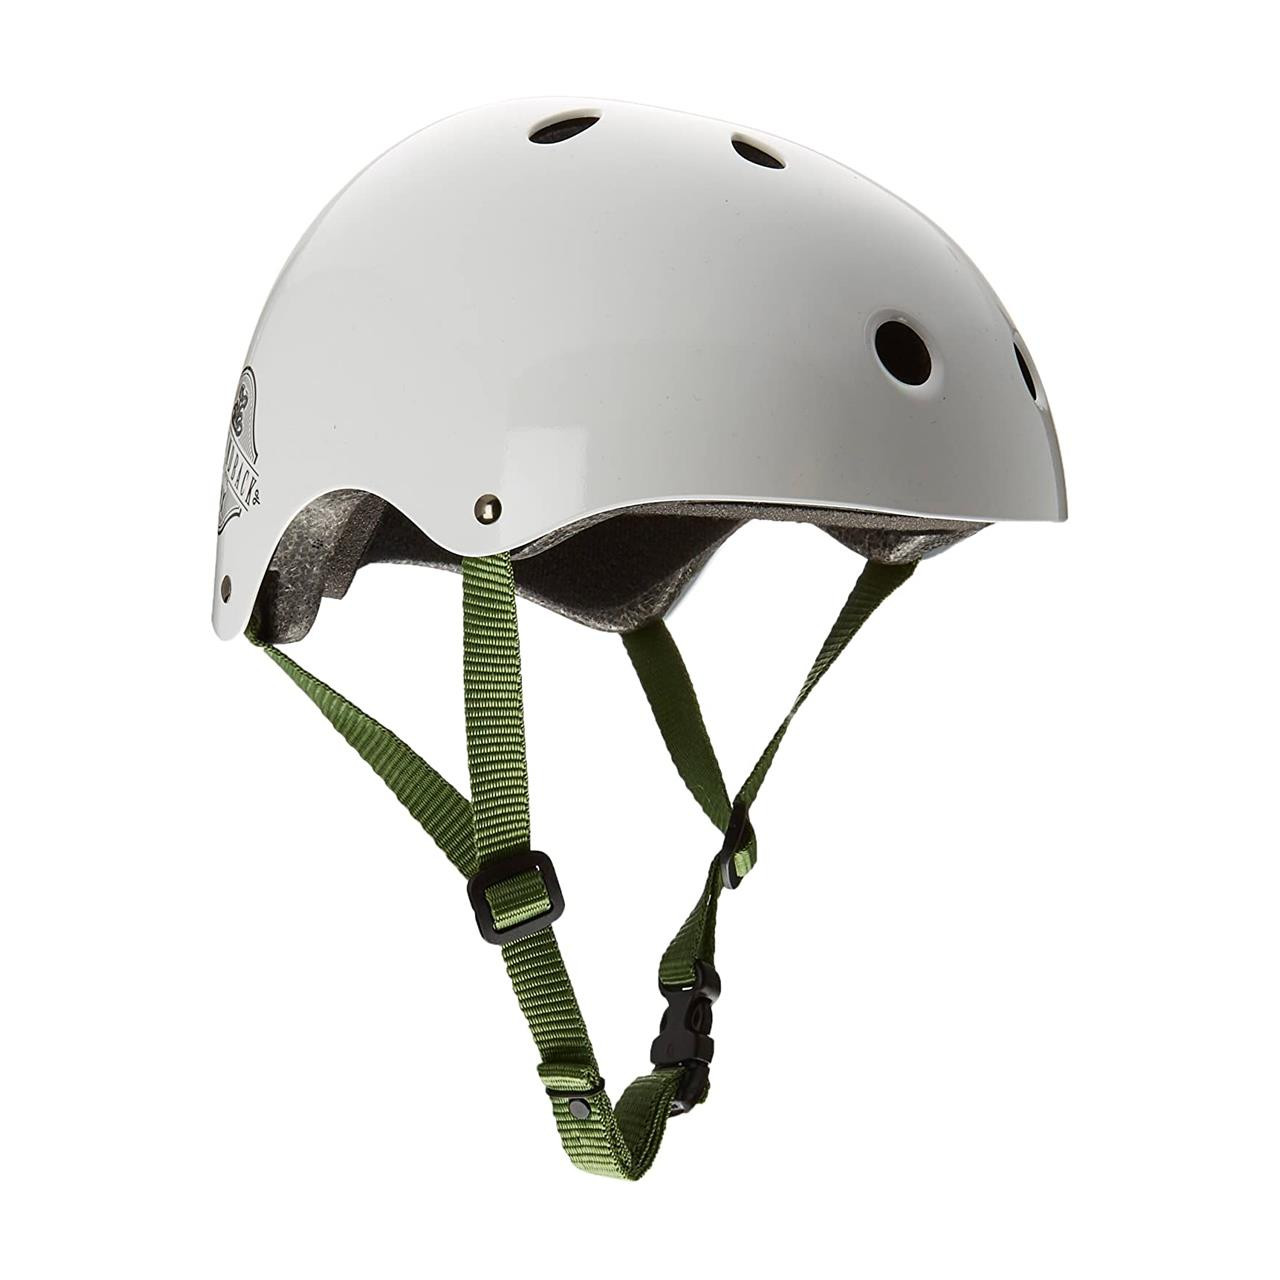 Diamondback BMX Helmet (Gloss White, Large)